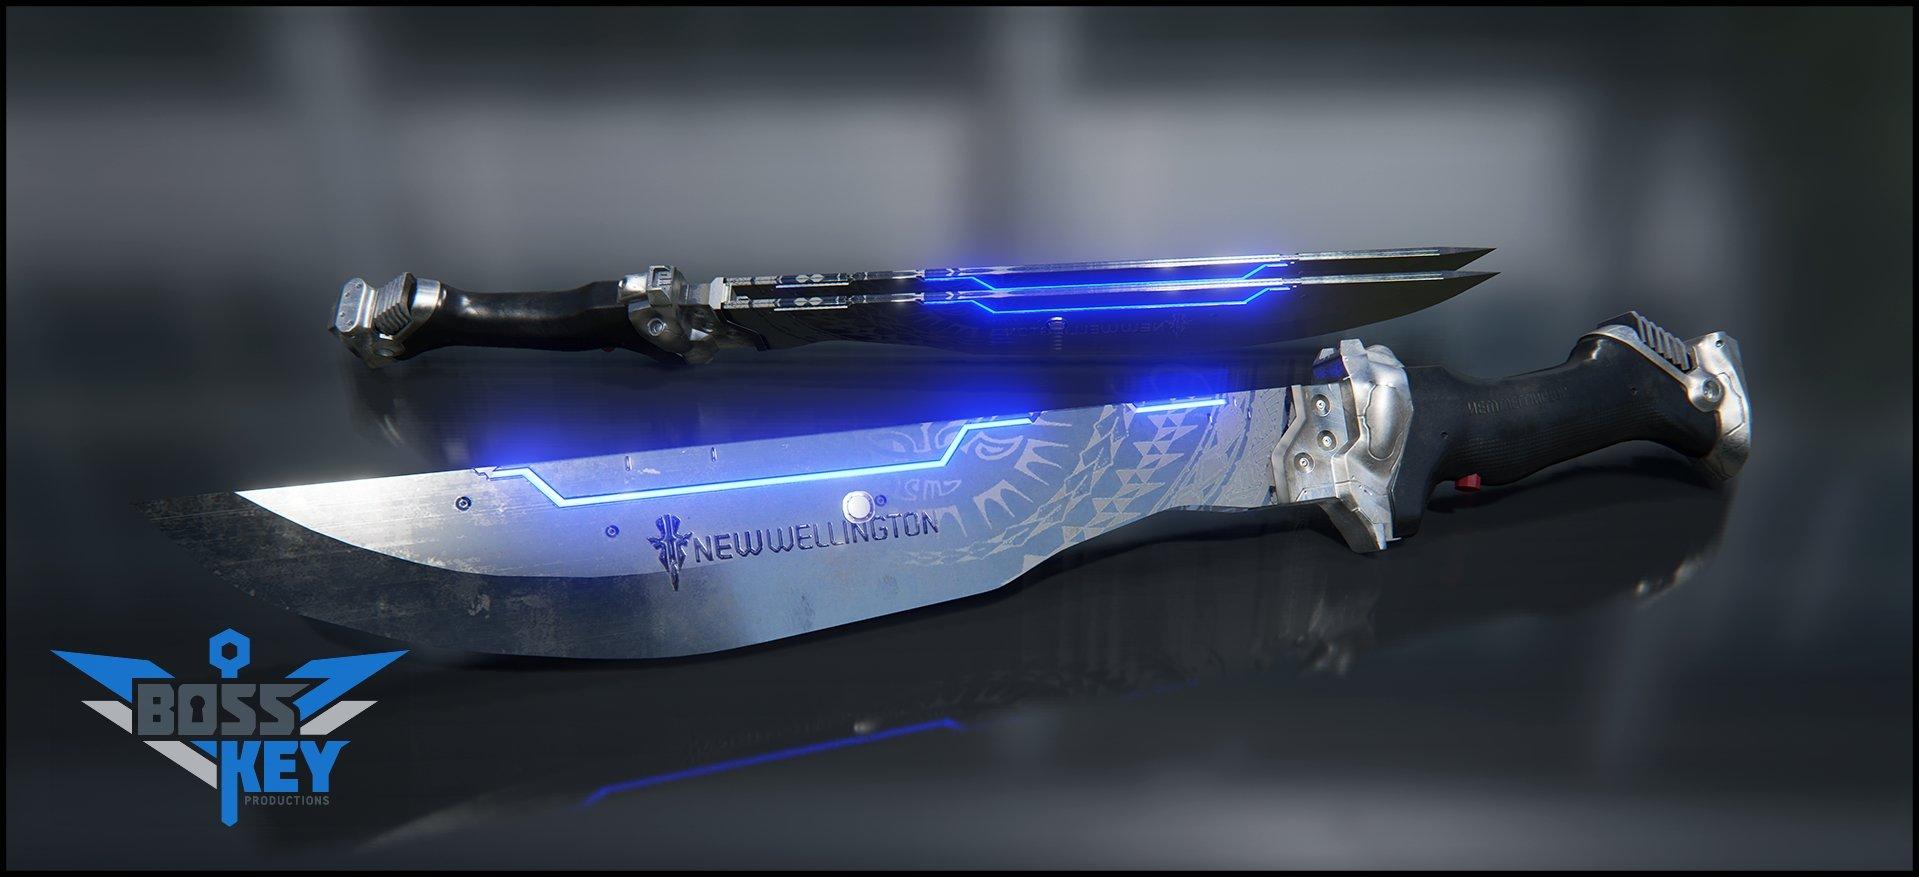 Boss key productions concept art depository taser machete 01 wm